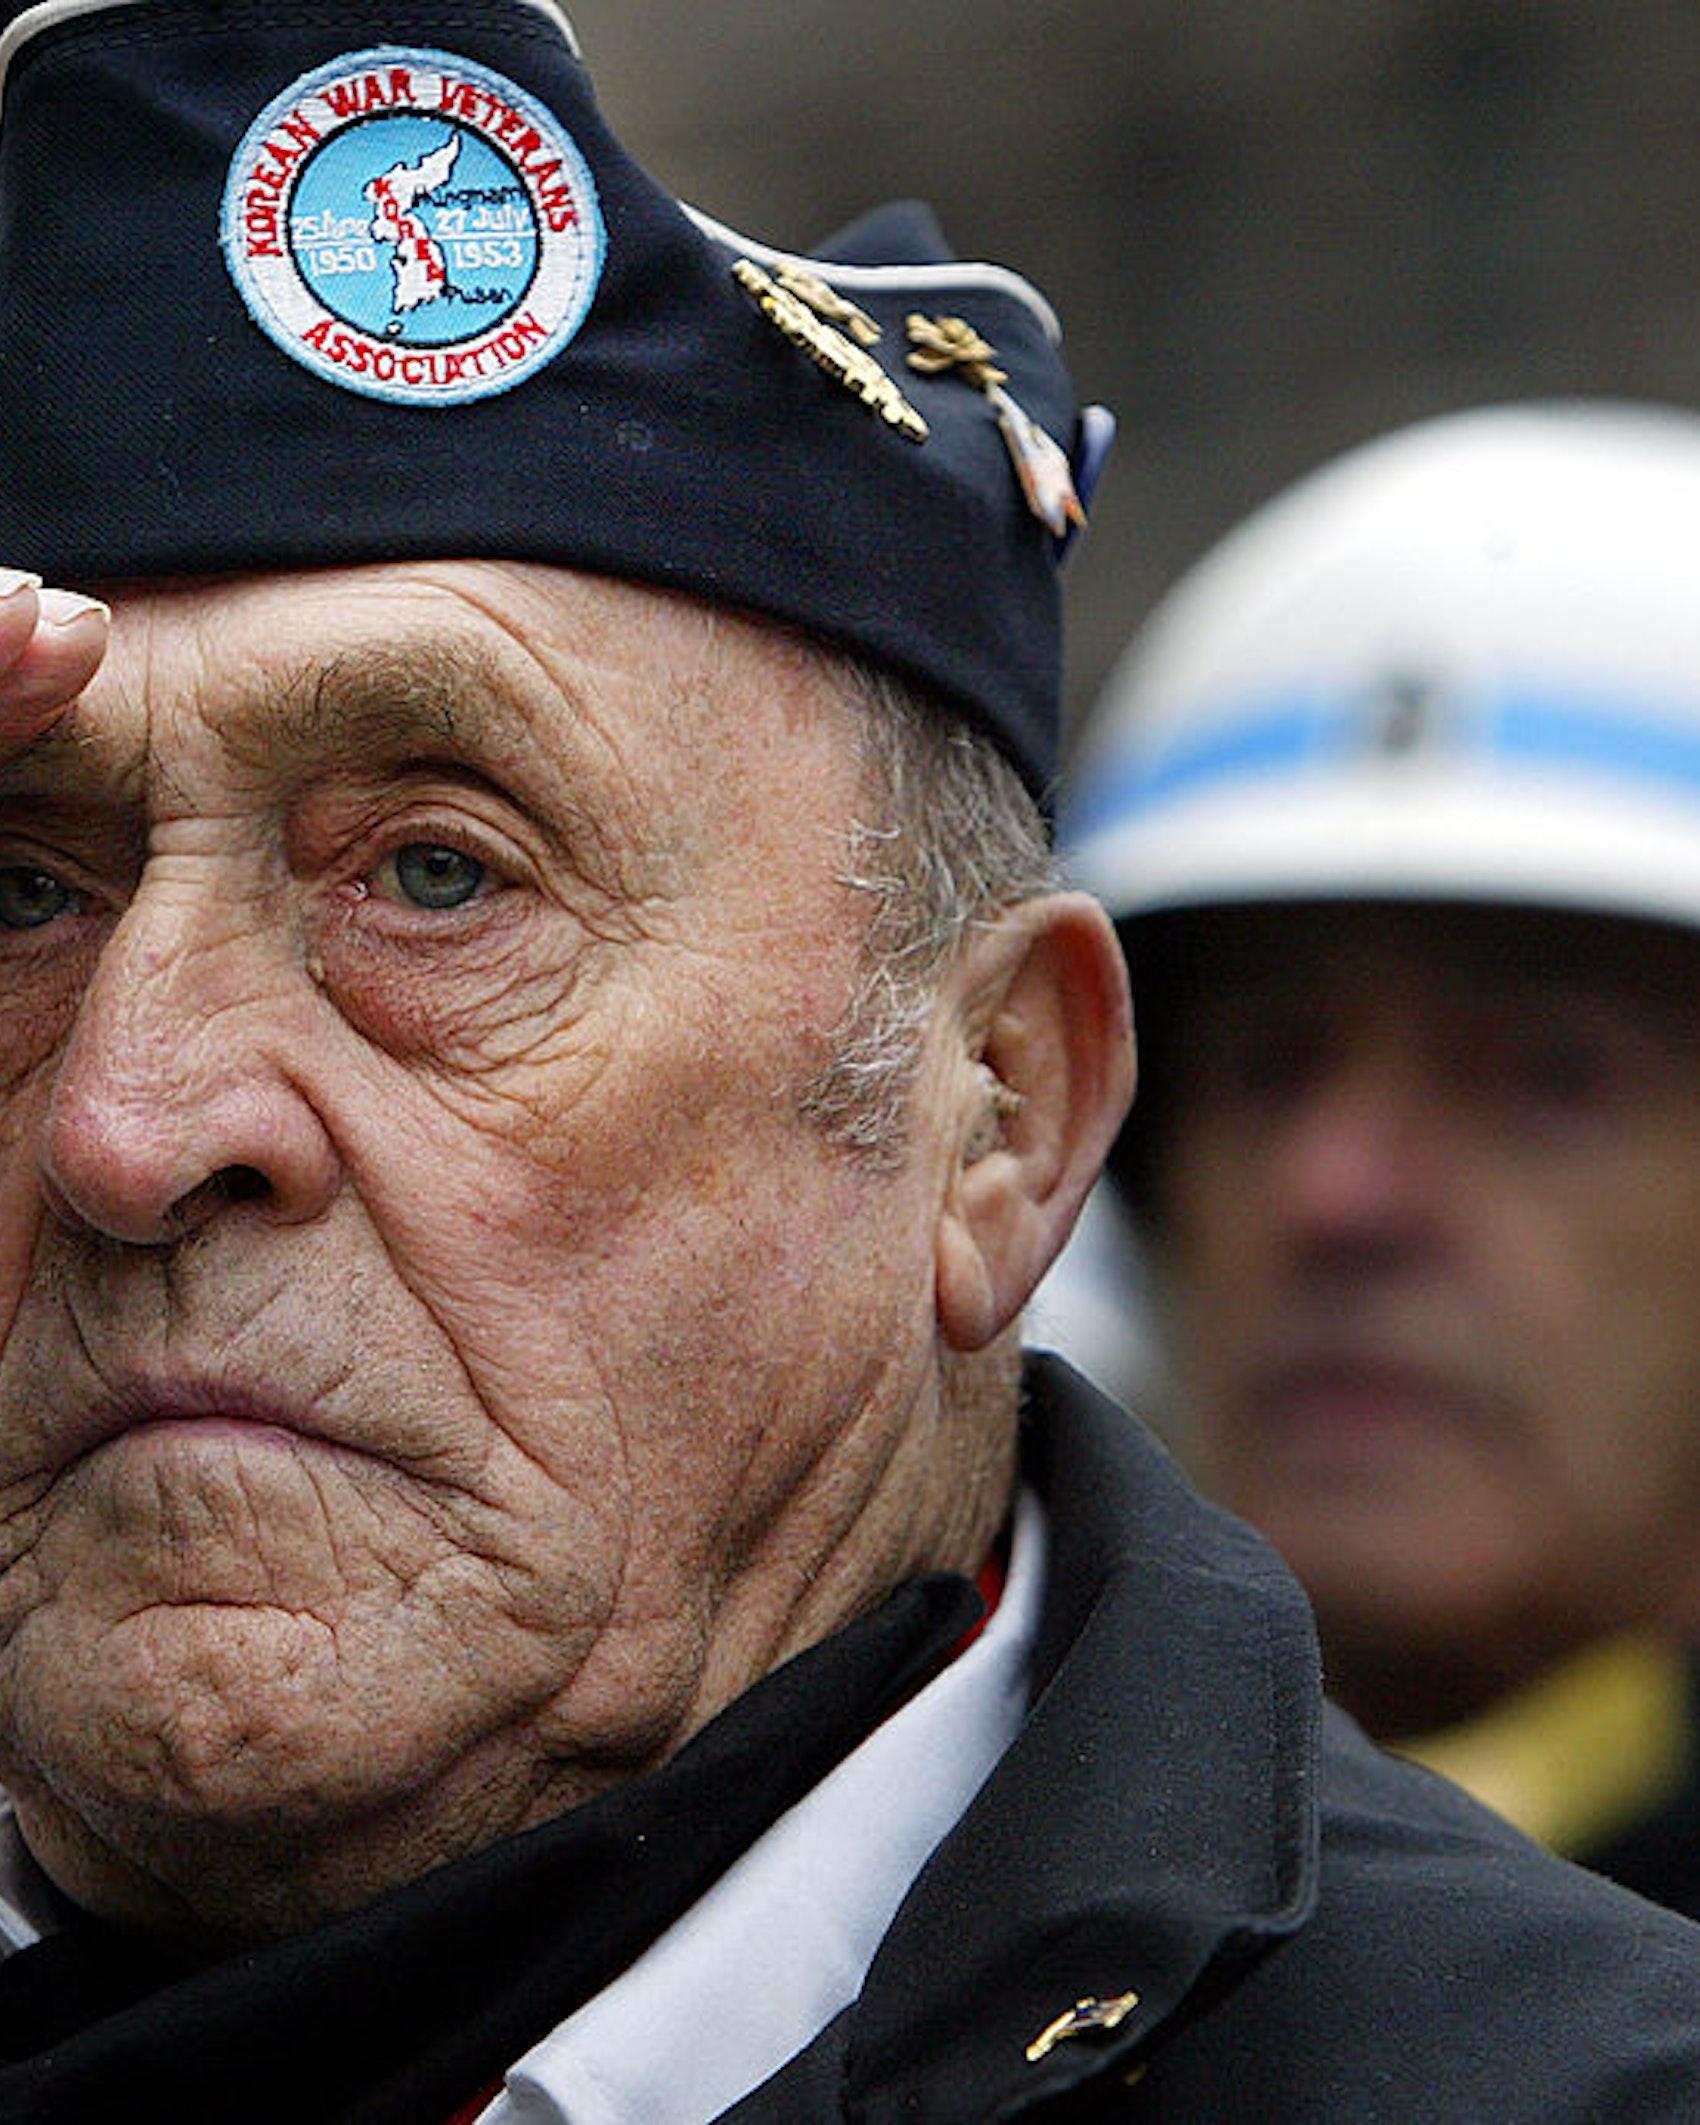 NEW YORK - NOVEMBER 11: U.S. Army Korean War veteran Joseph Meunier salutes during a Veterans Day Wreath Ceremony November 11, 2003 in New York City. (Photo by Mario Tama/Getty Images)